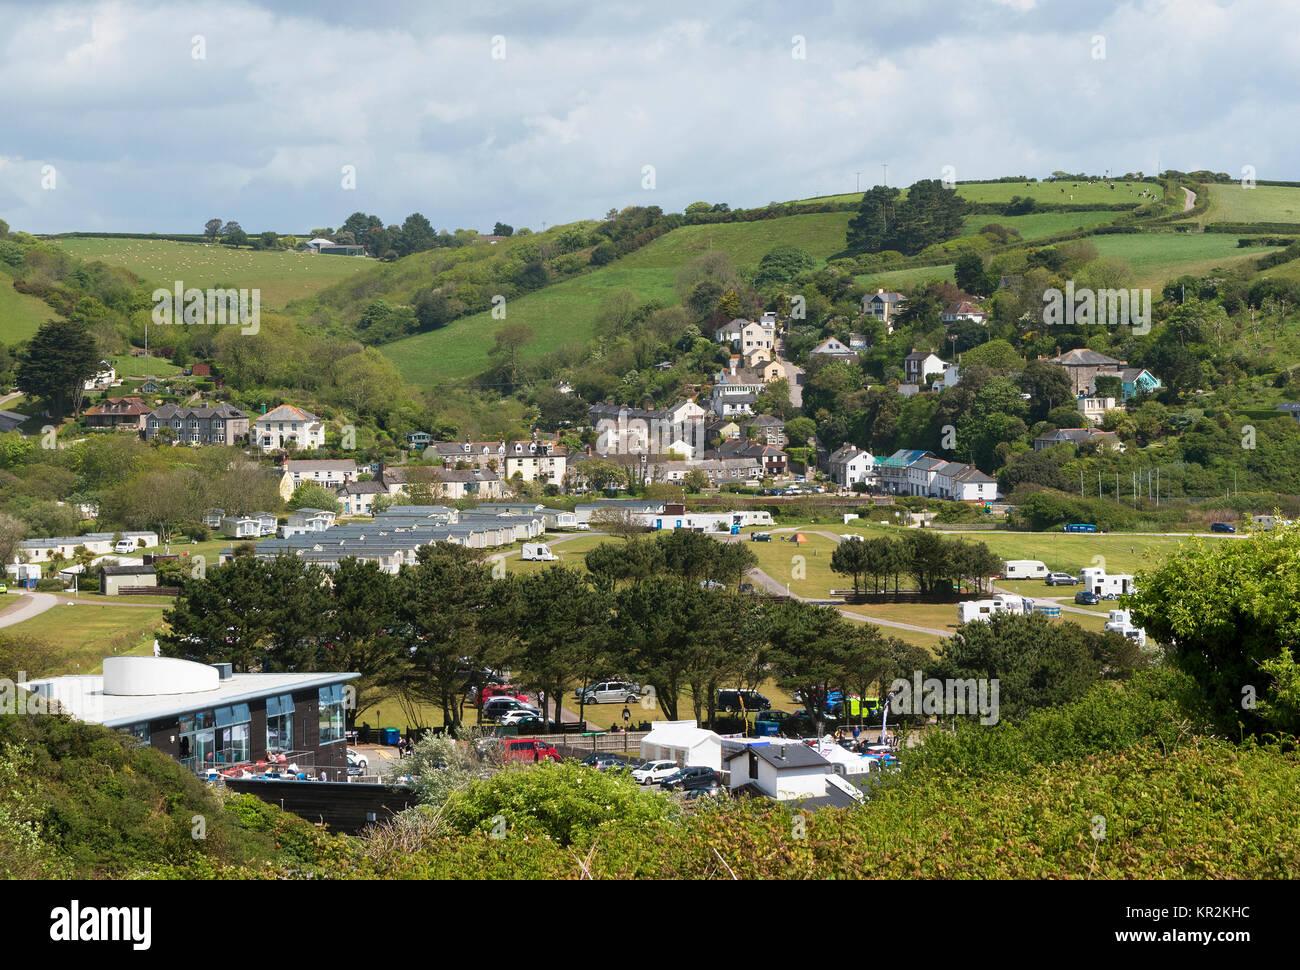 the village of pentewan in cornwall, england, britain, uk. Stock Photo